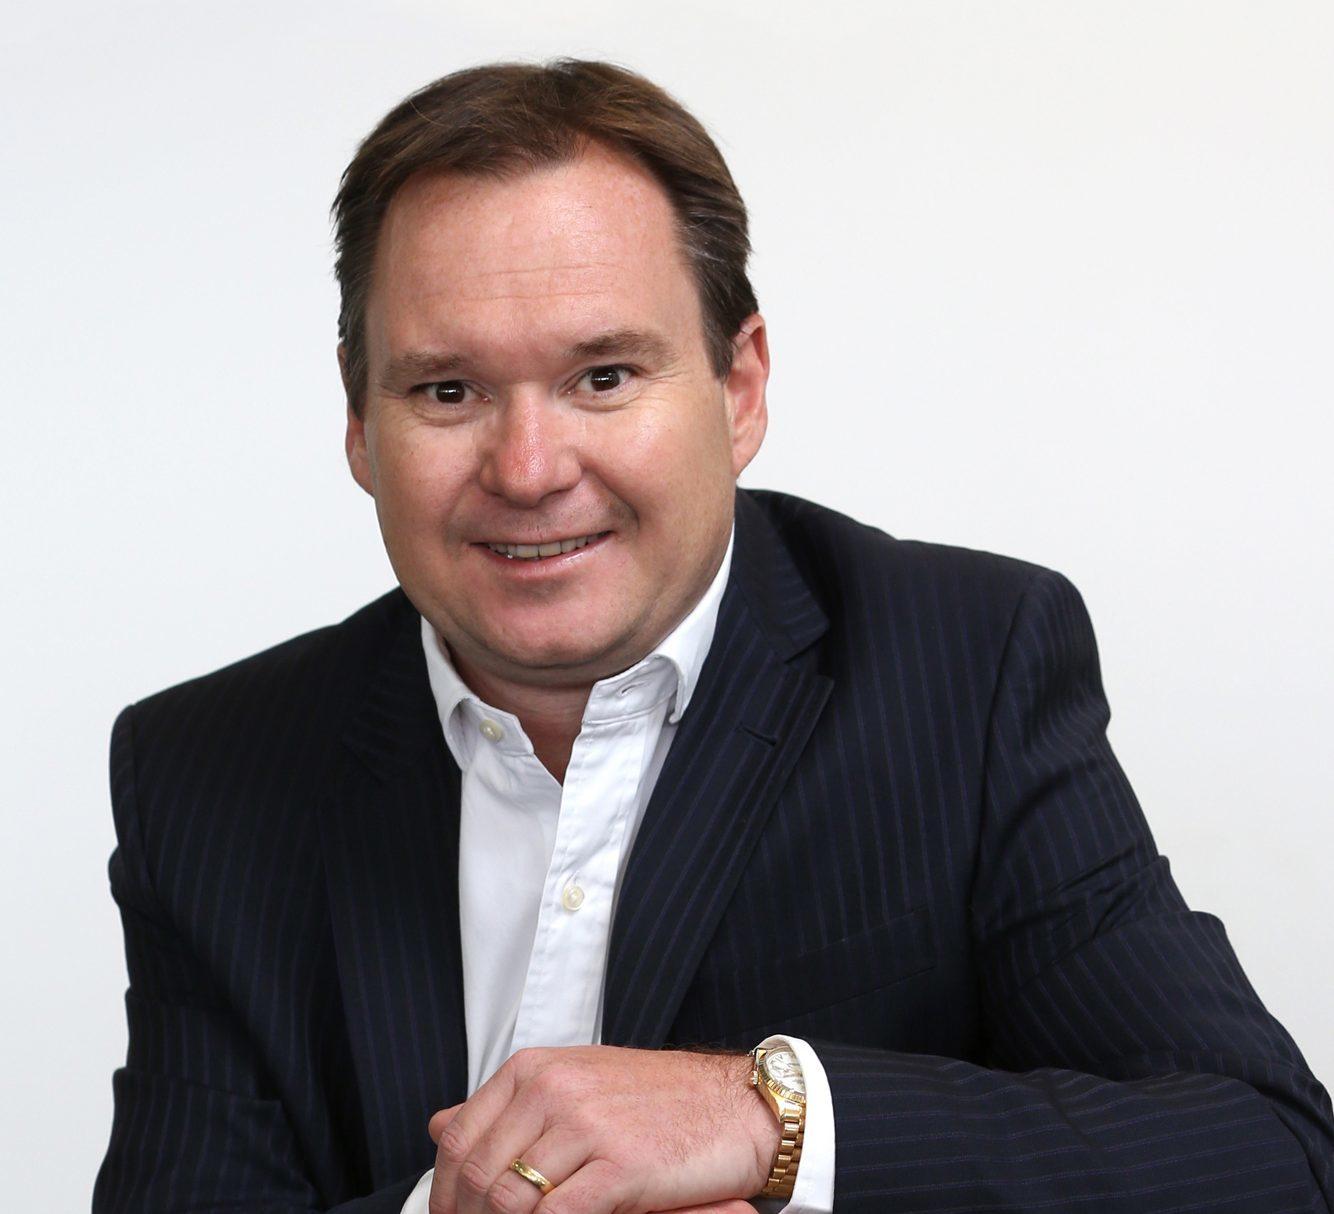 Bruce Bultitude, Power Jack's executive chairman